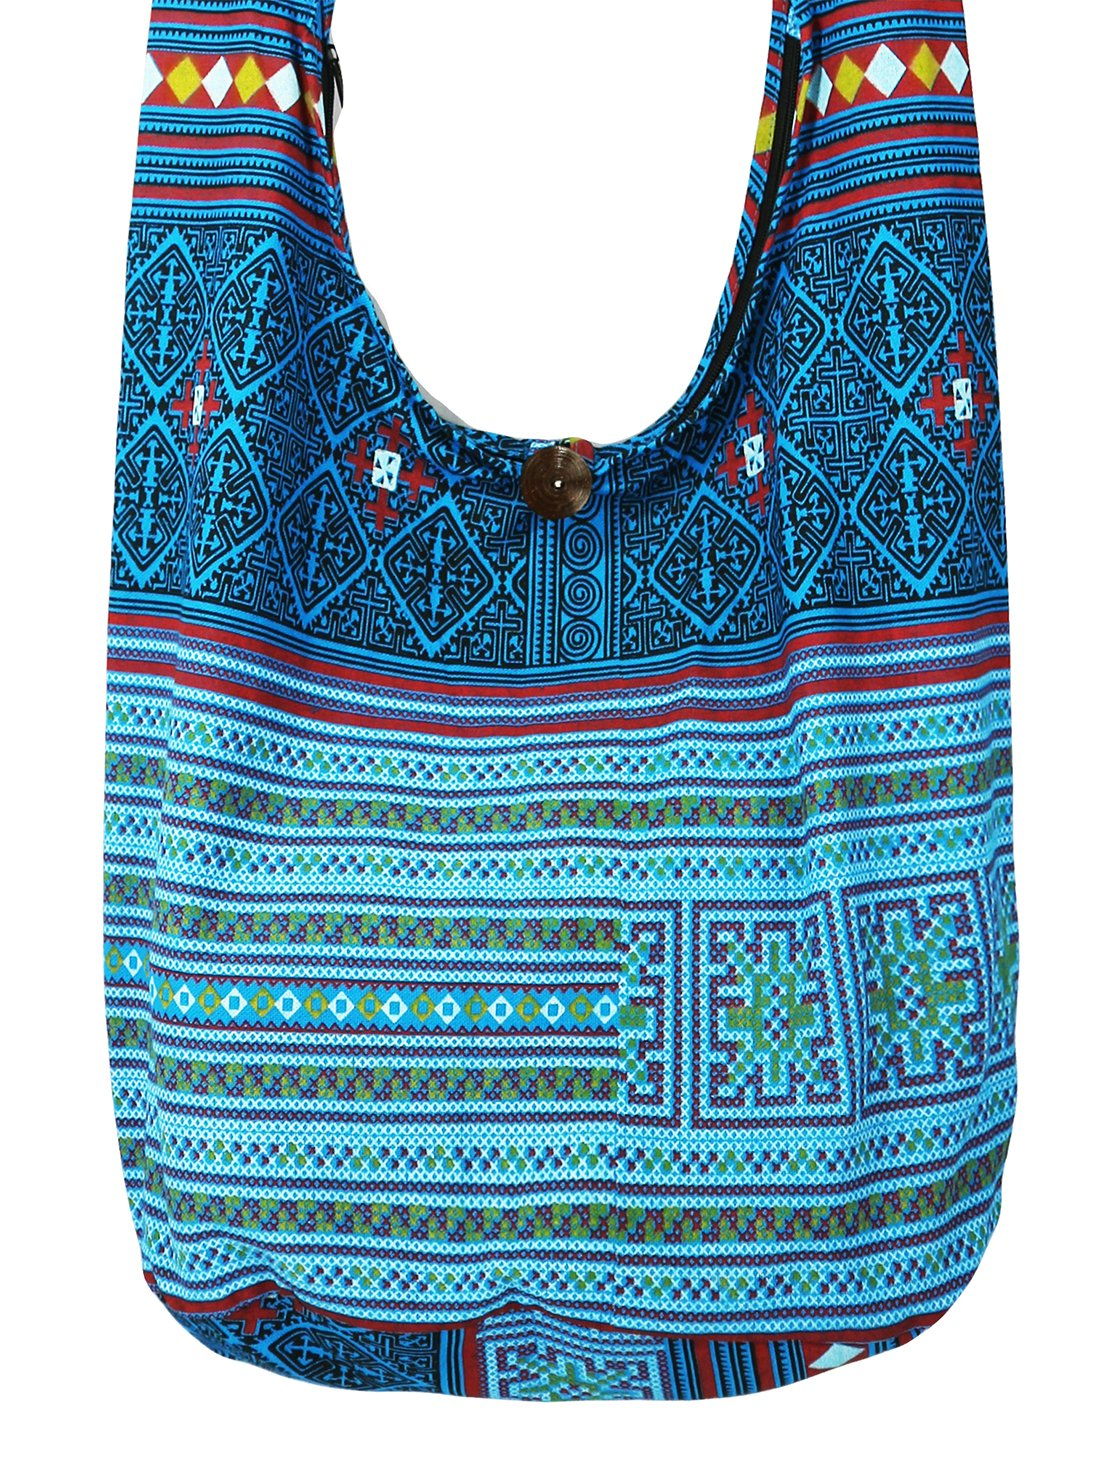 Lovely Creations's Hippie Boho New Elephant Crossbody Bohemian Gypsy Sling Bag Shoulder Bag Large Size (Hmong Blue)